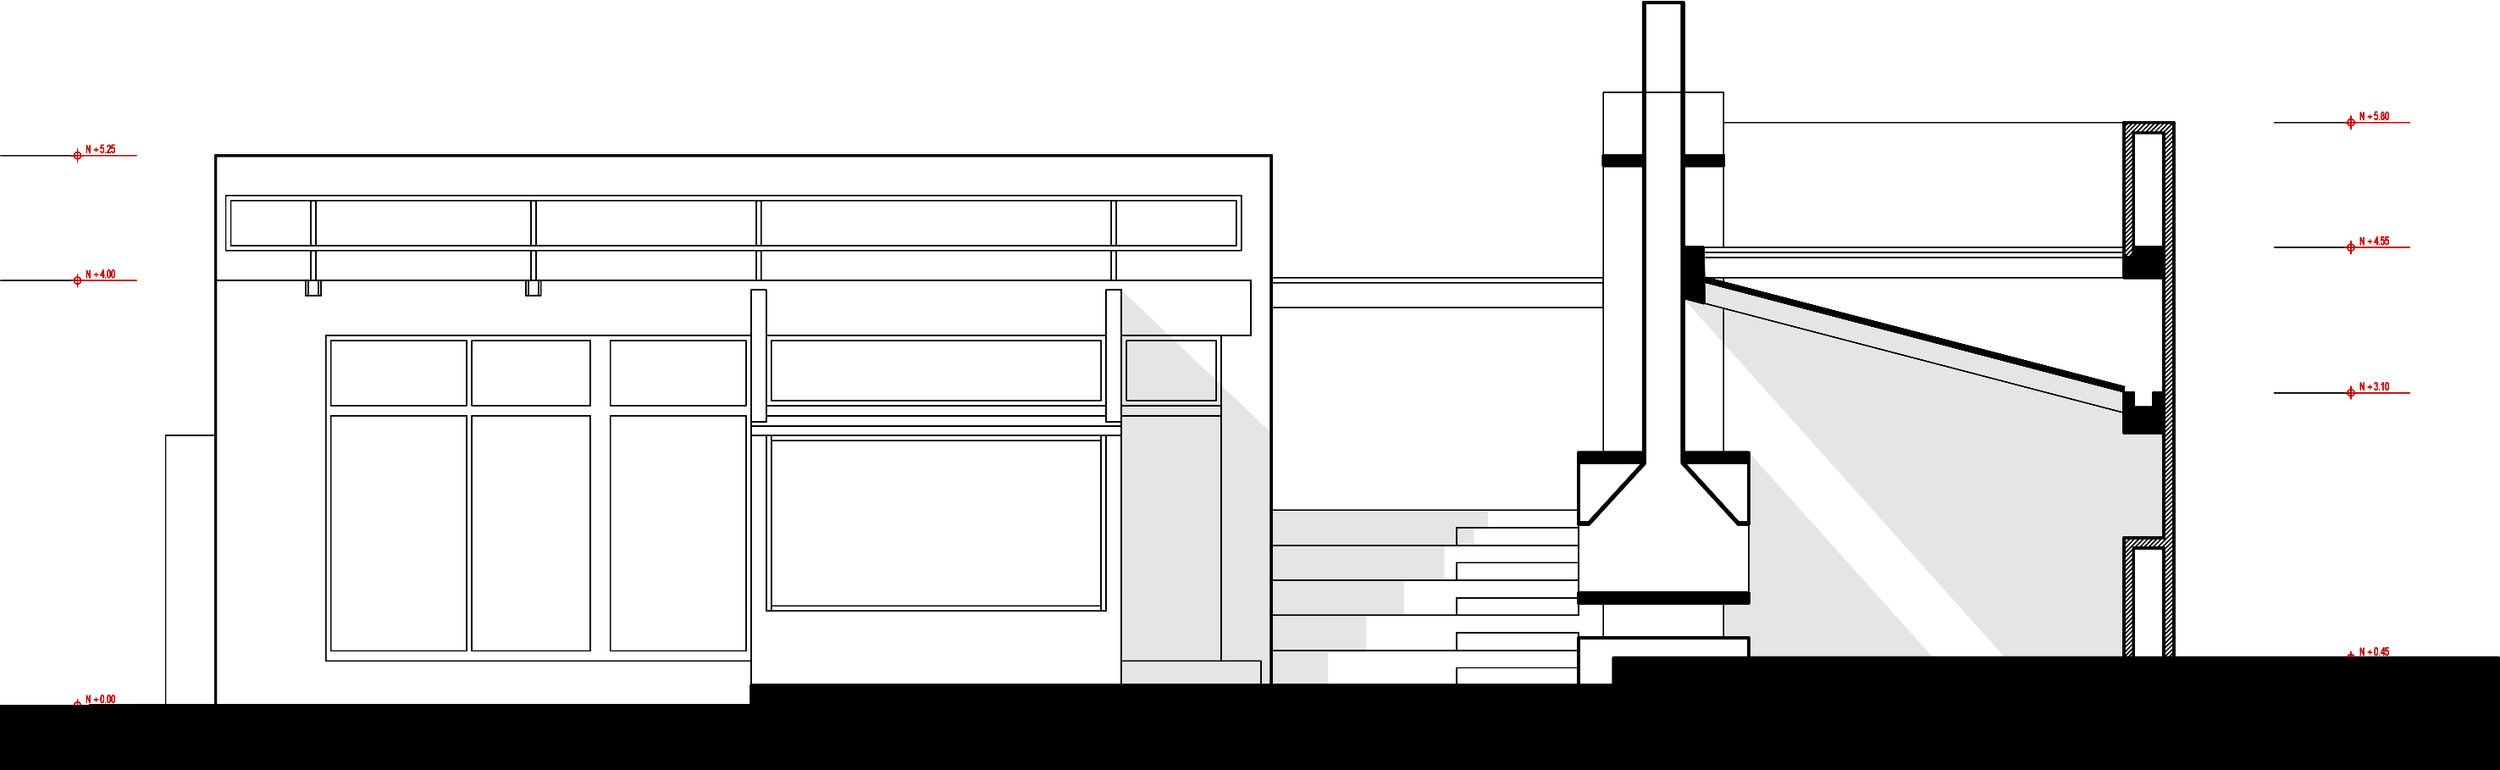 rg-seccion longitudinal.jpg